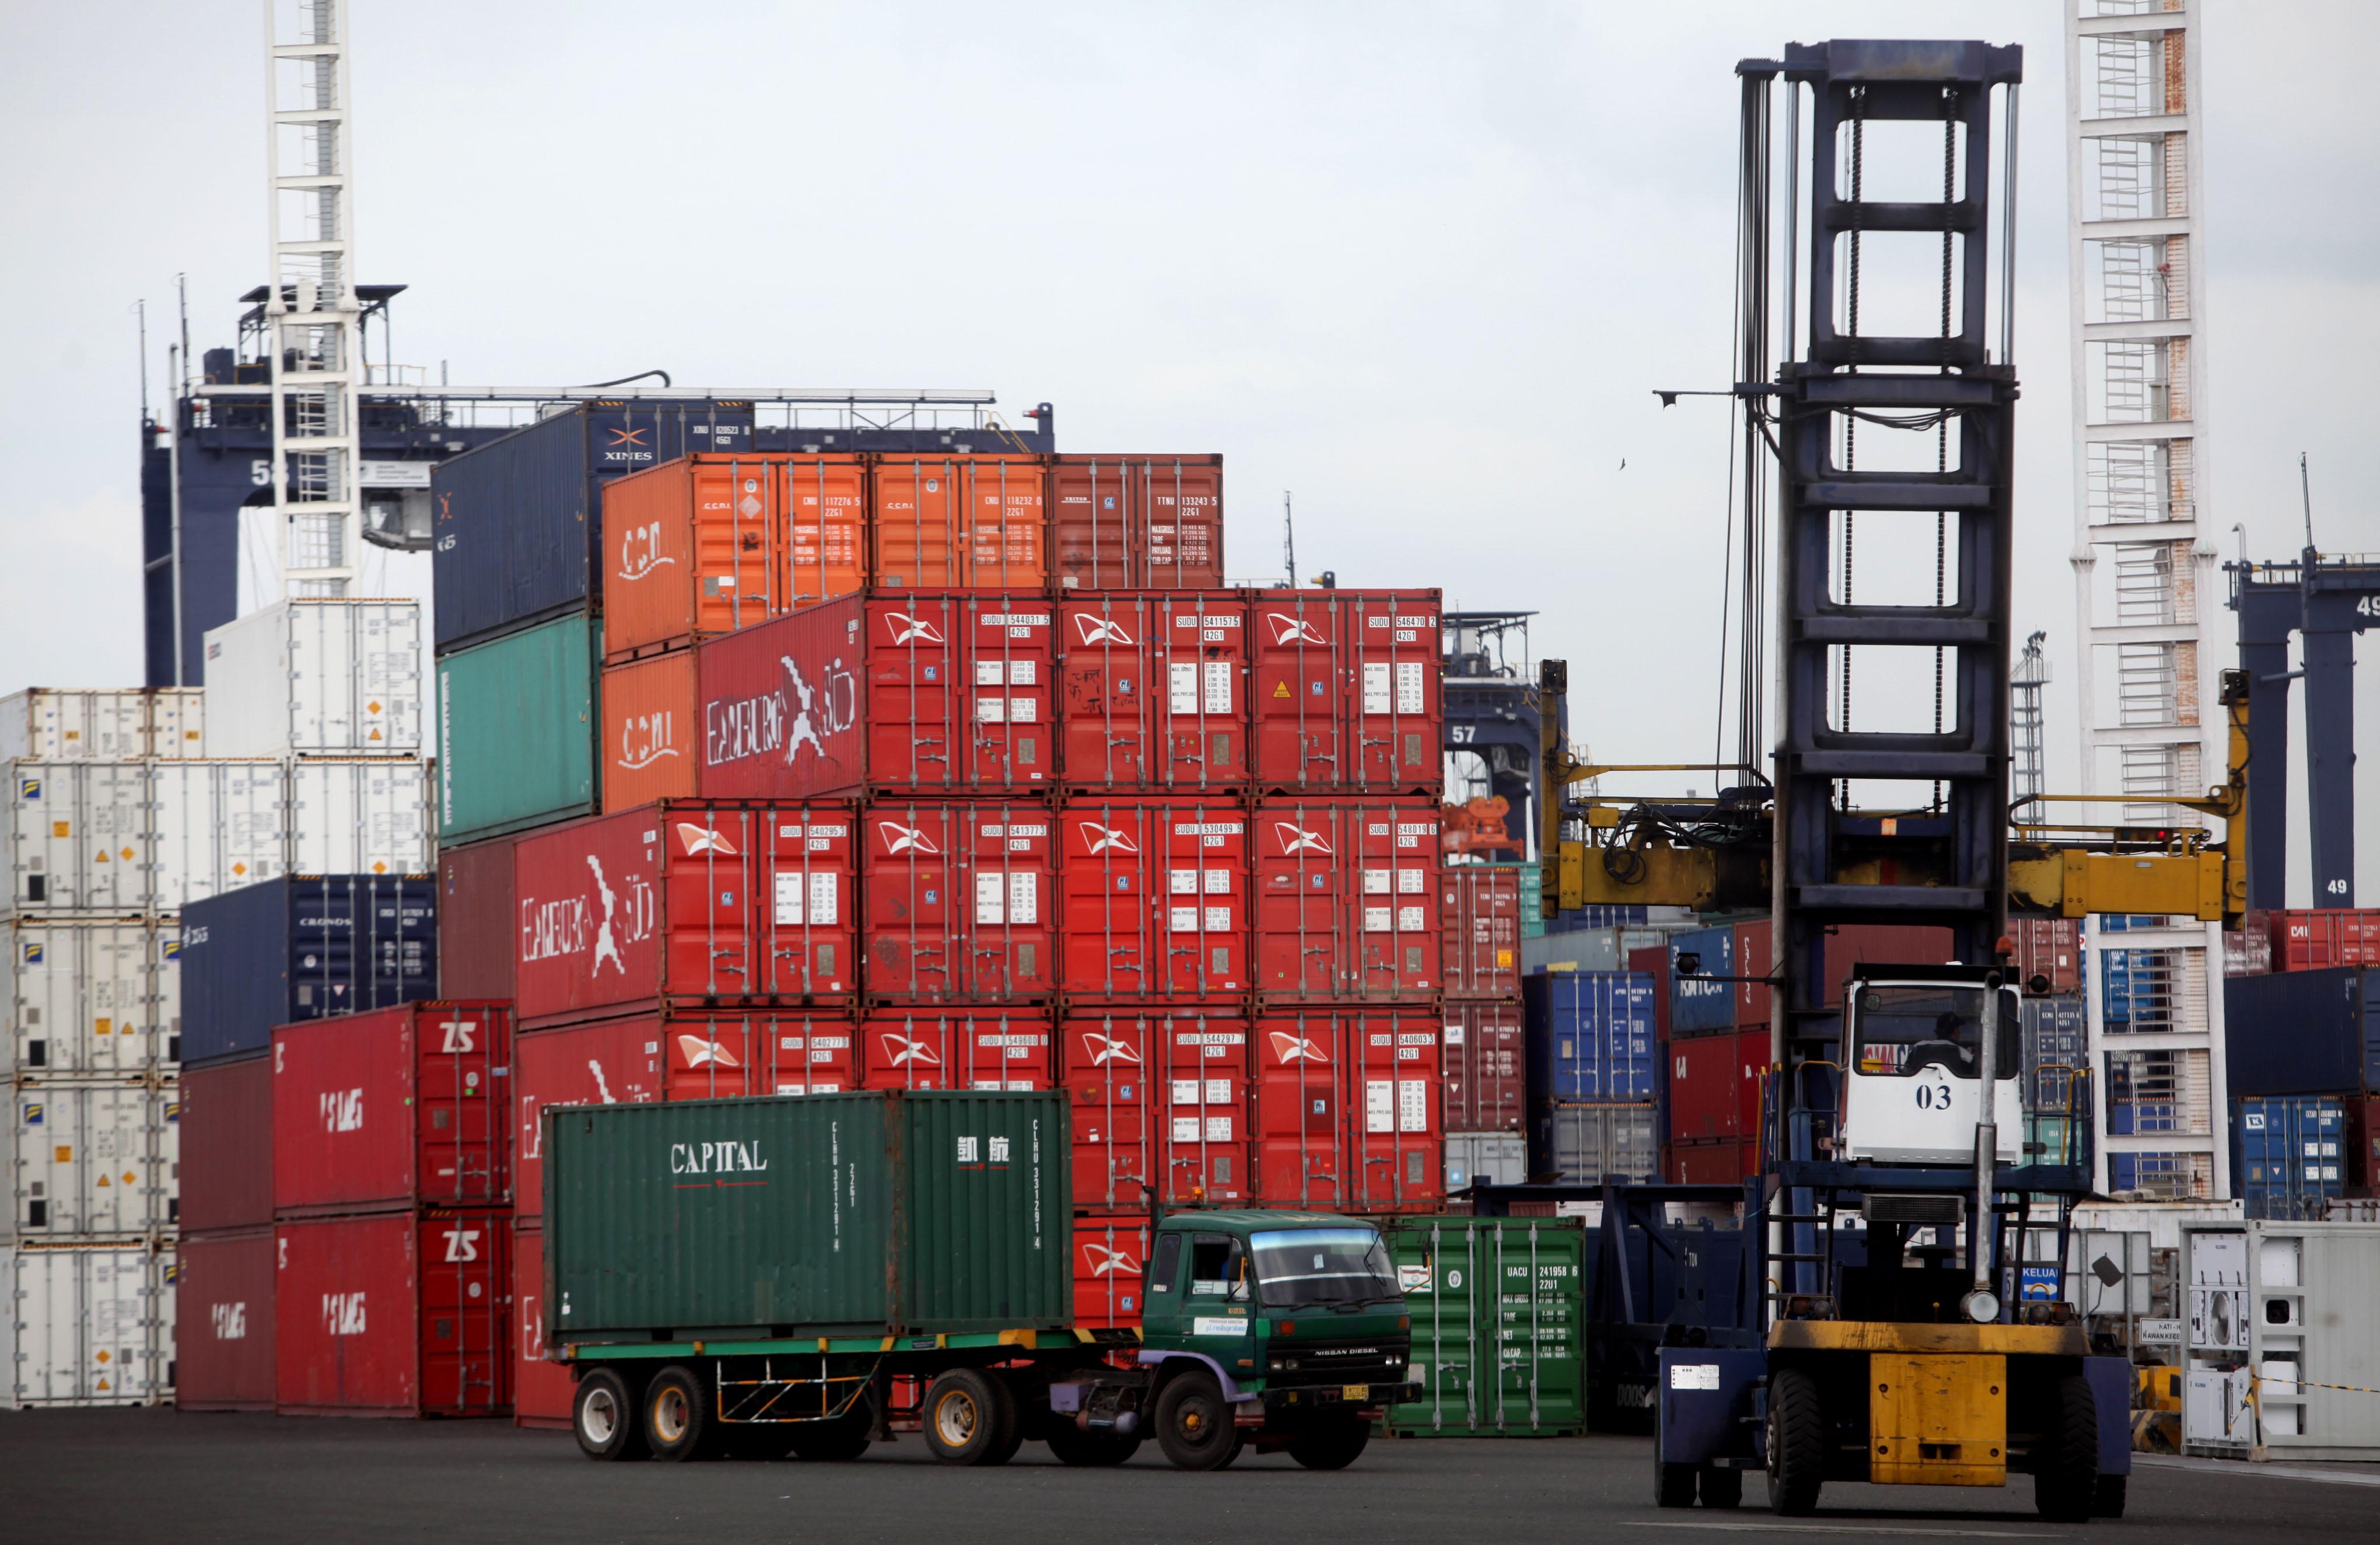 Ongkos Logistik Domestik Masih Lebih Mahal Ketimbang Antar Negara